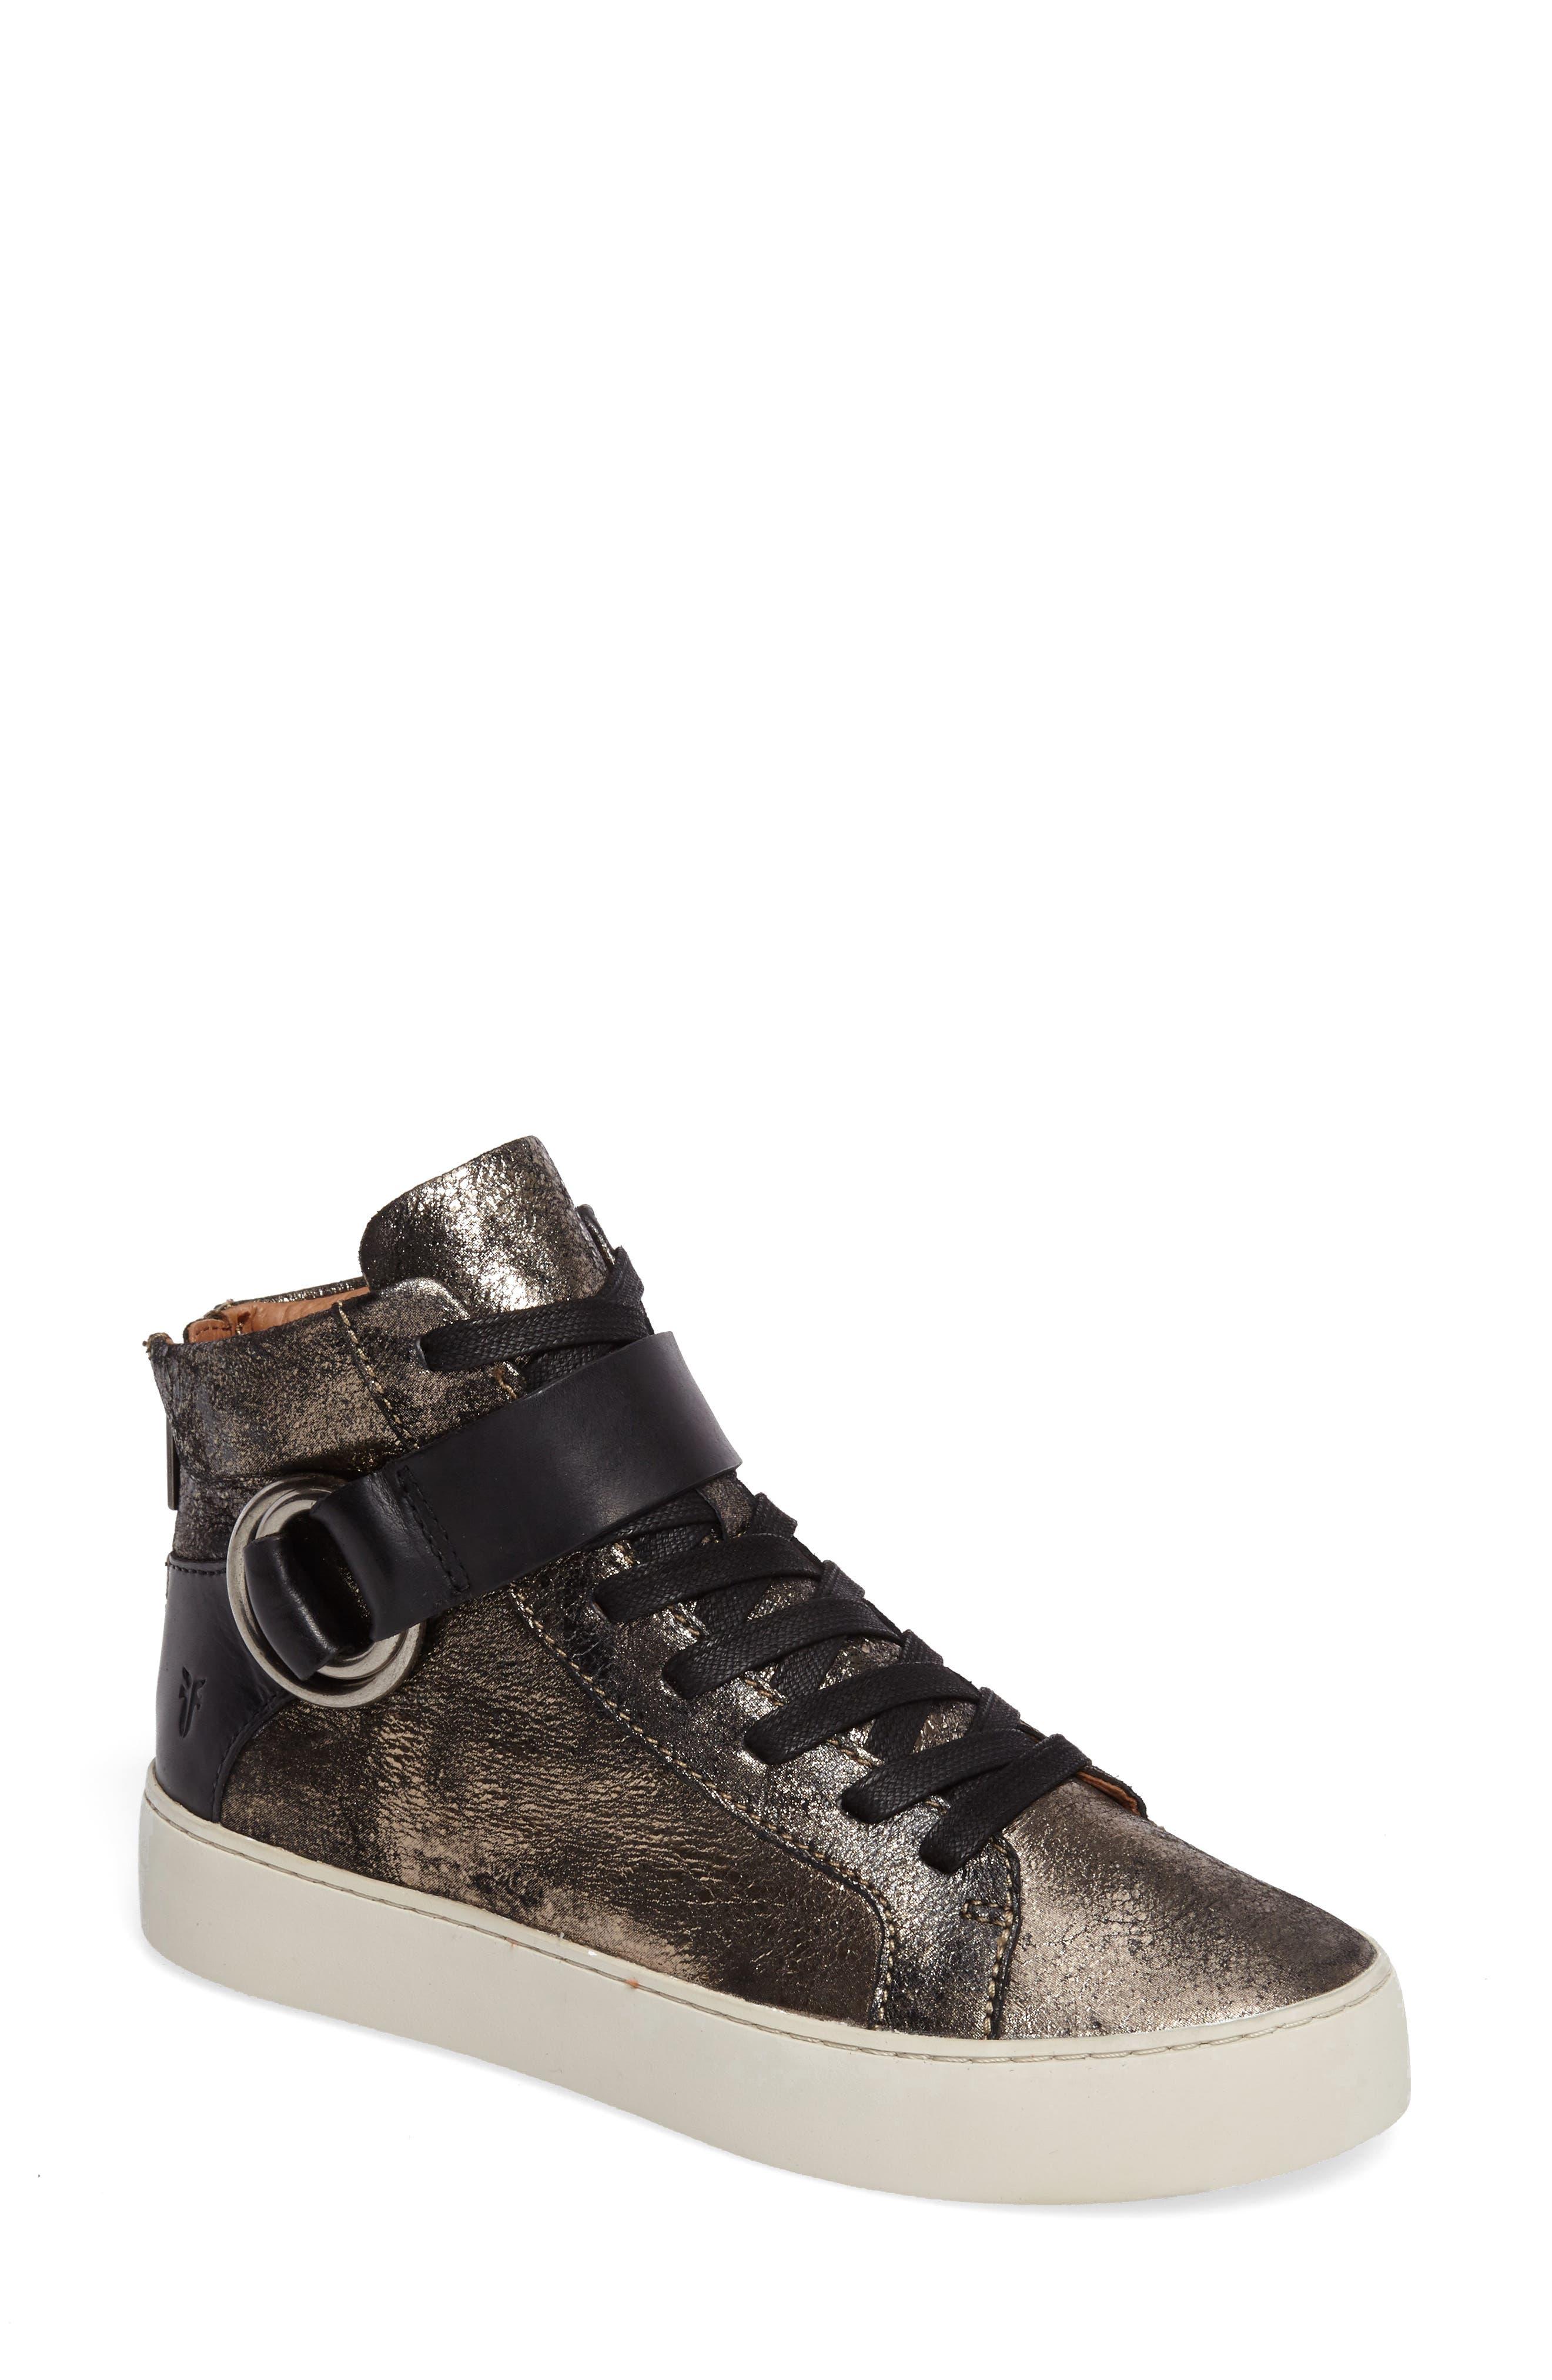 Alternate Image 1 Selected - Frye Lena Harness High Top Sneaker (Women)